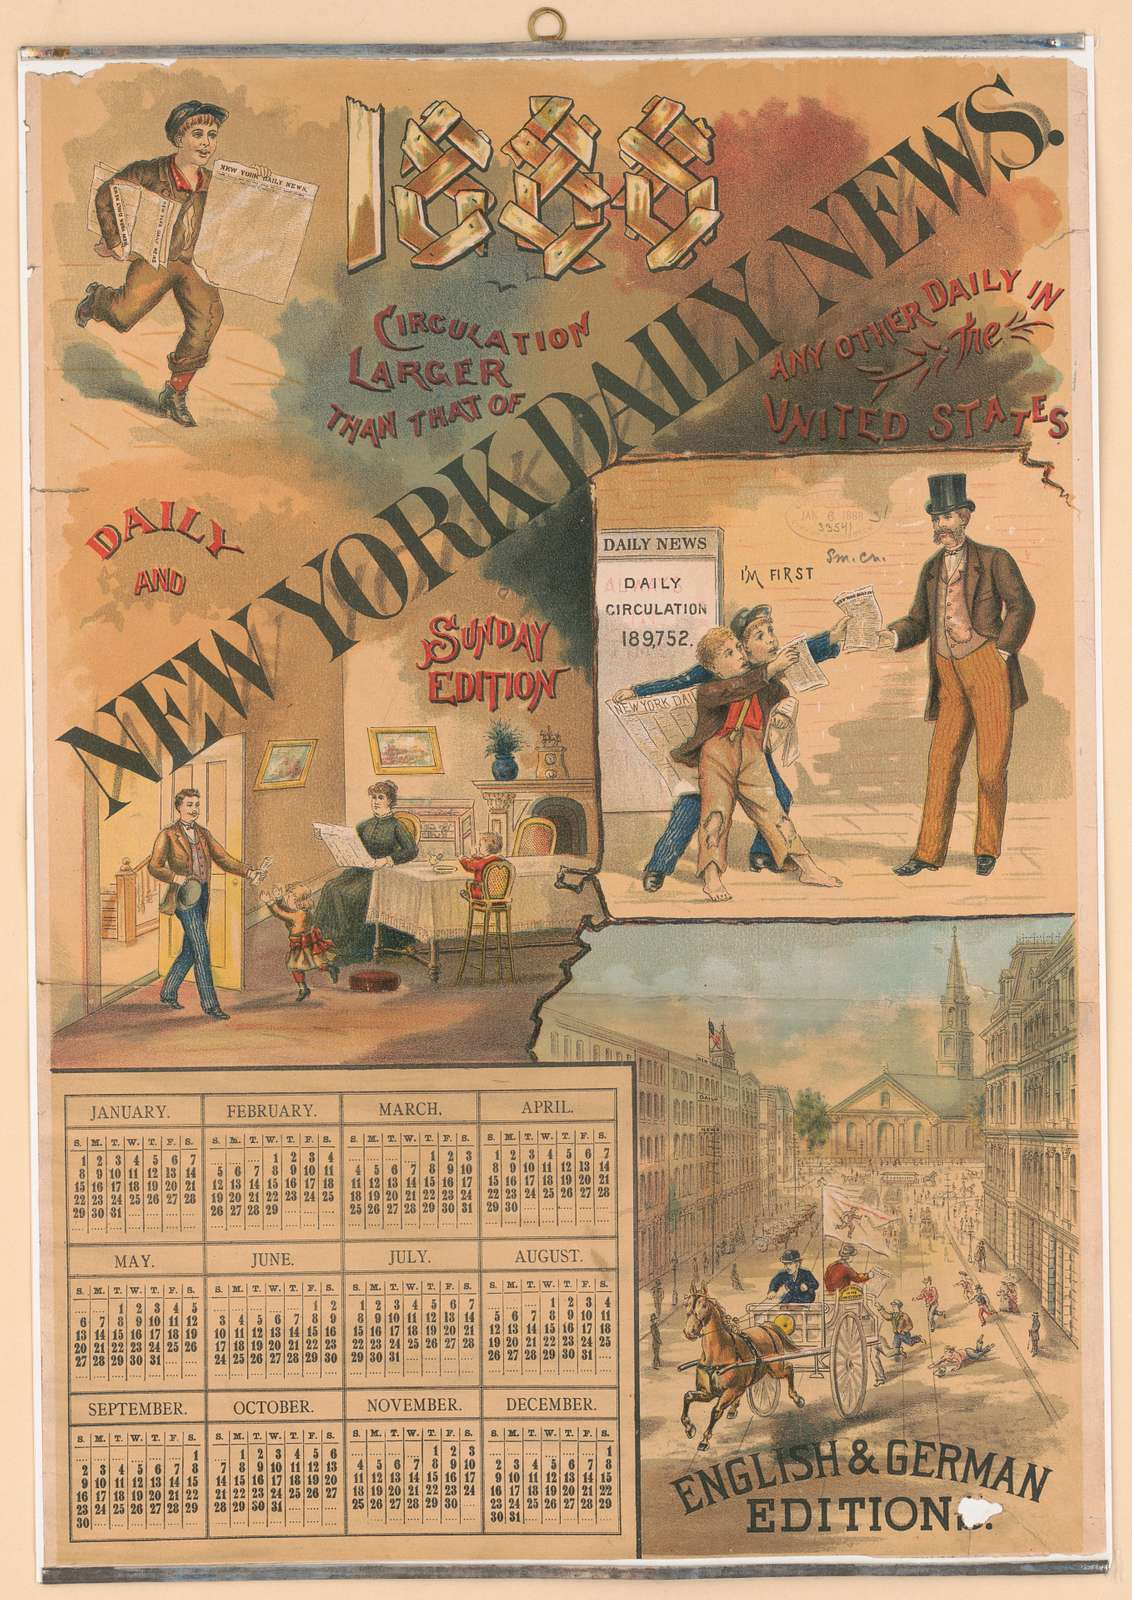 New York Daily News [calendar for 1888]